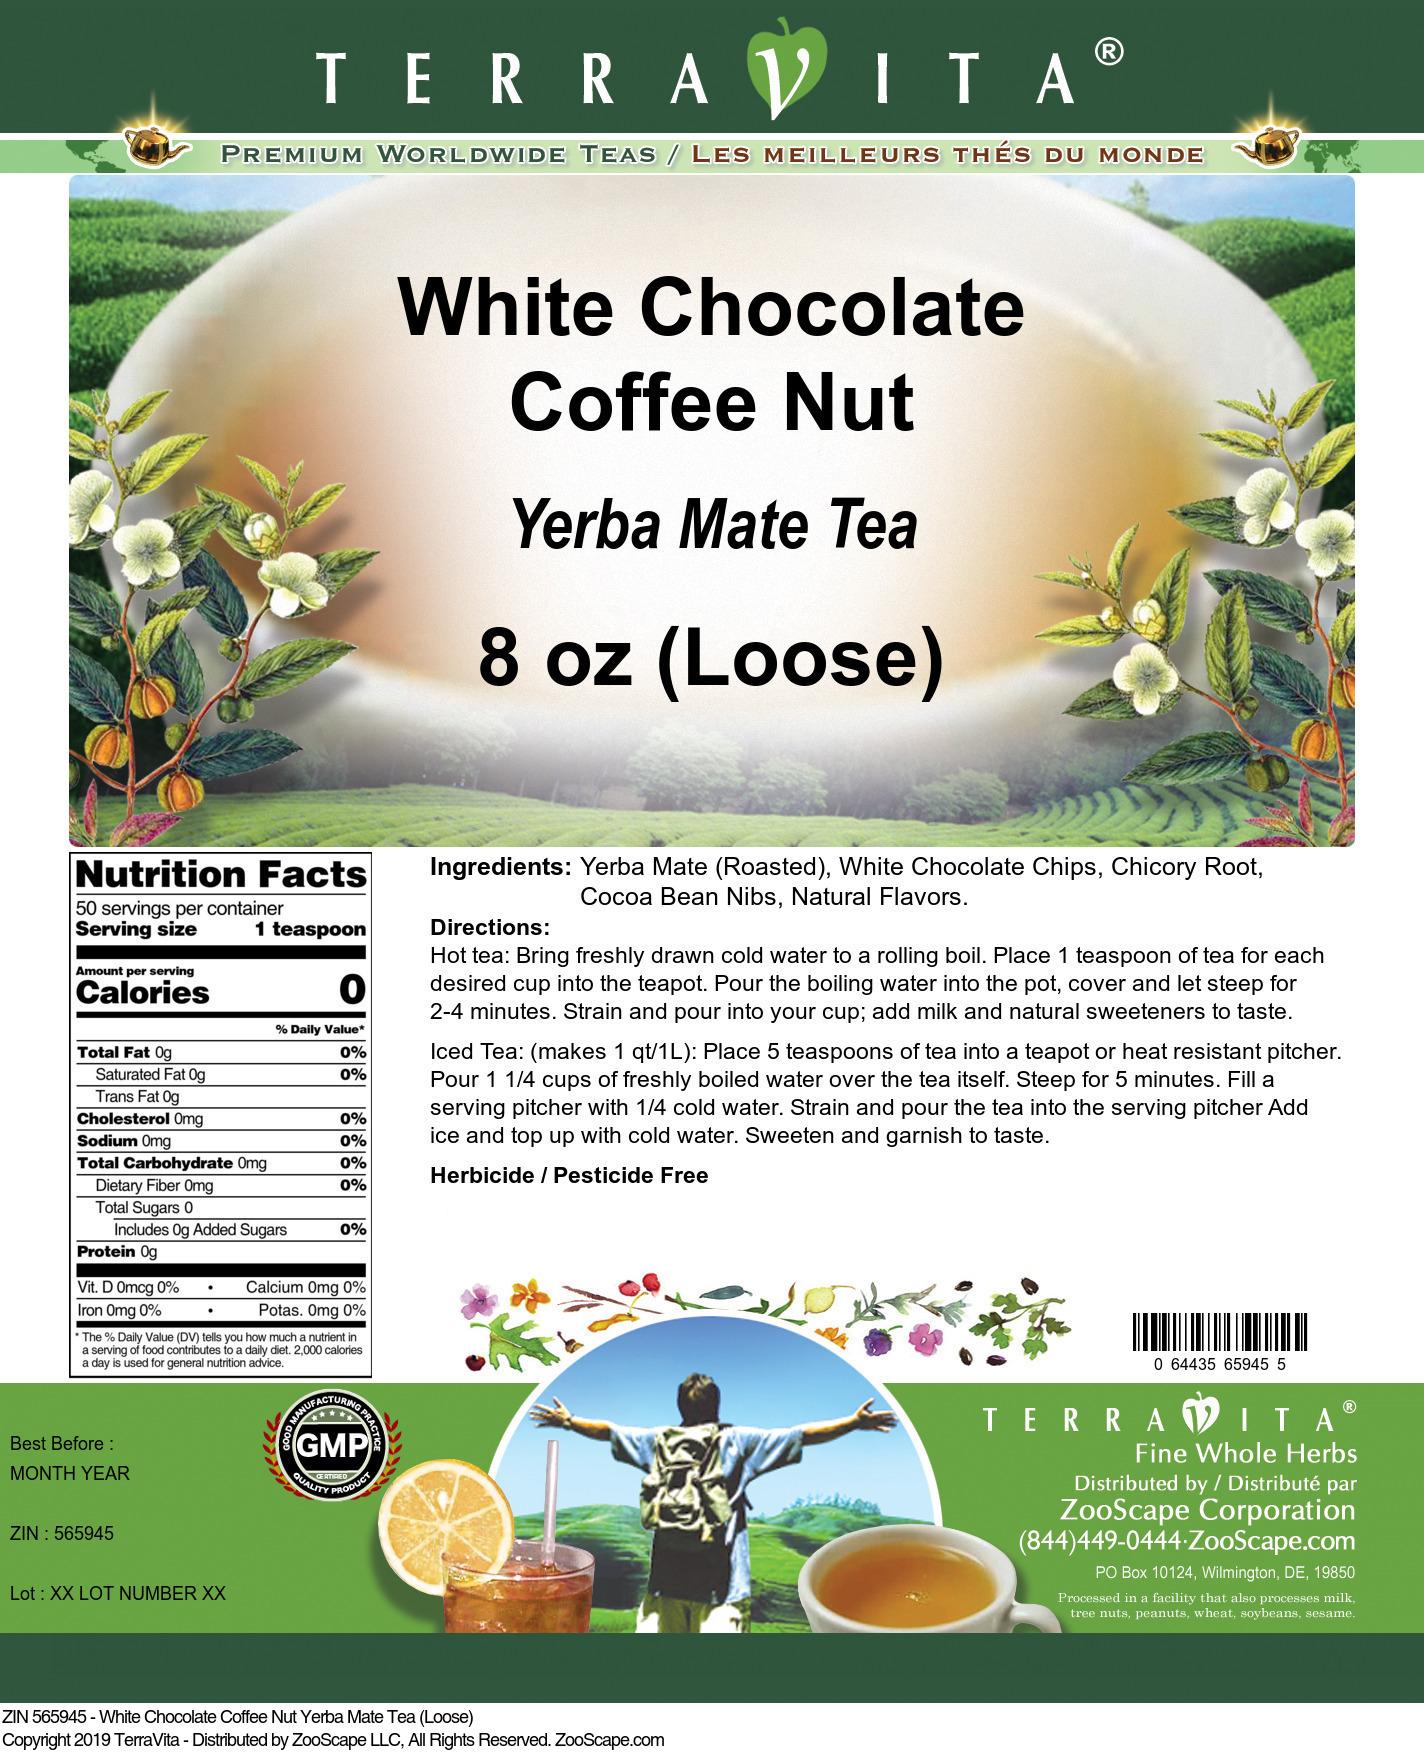 White Chocolate Coffee Nut Yerba Mate